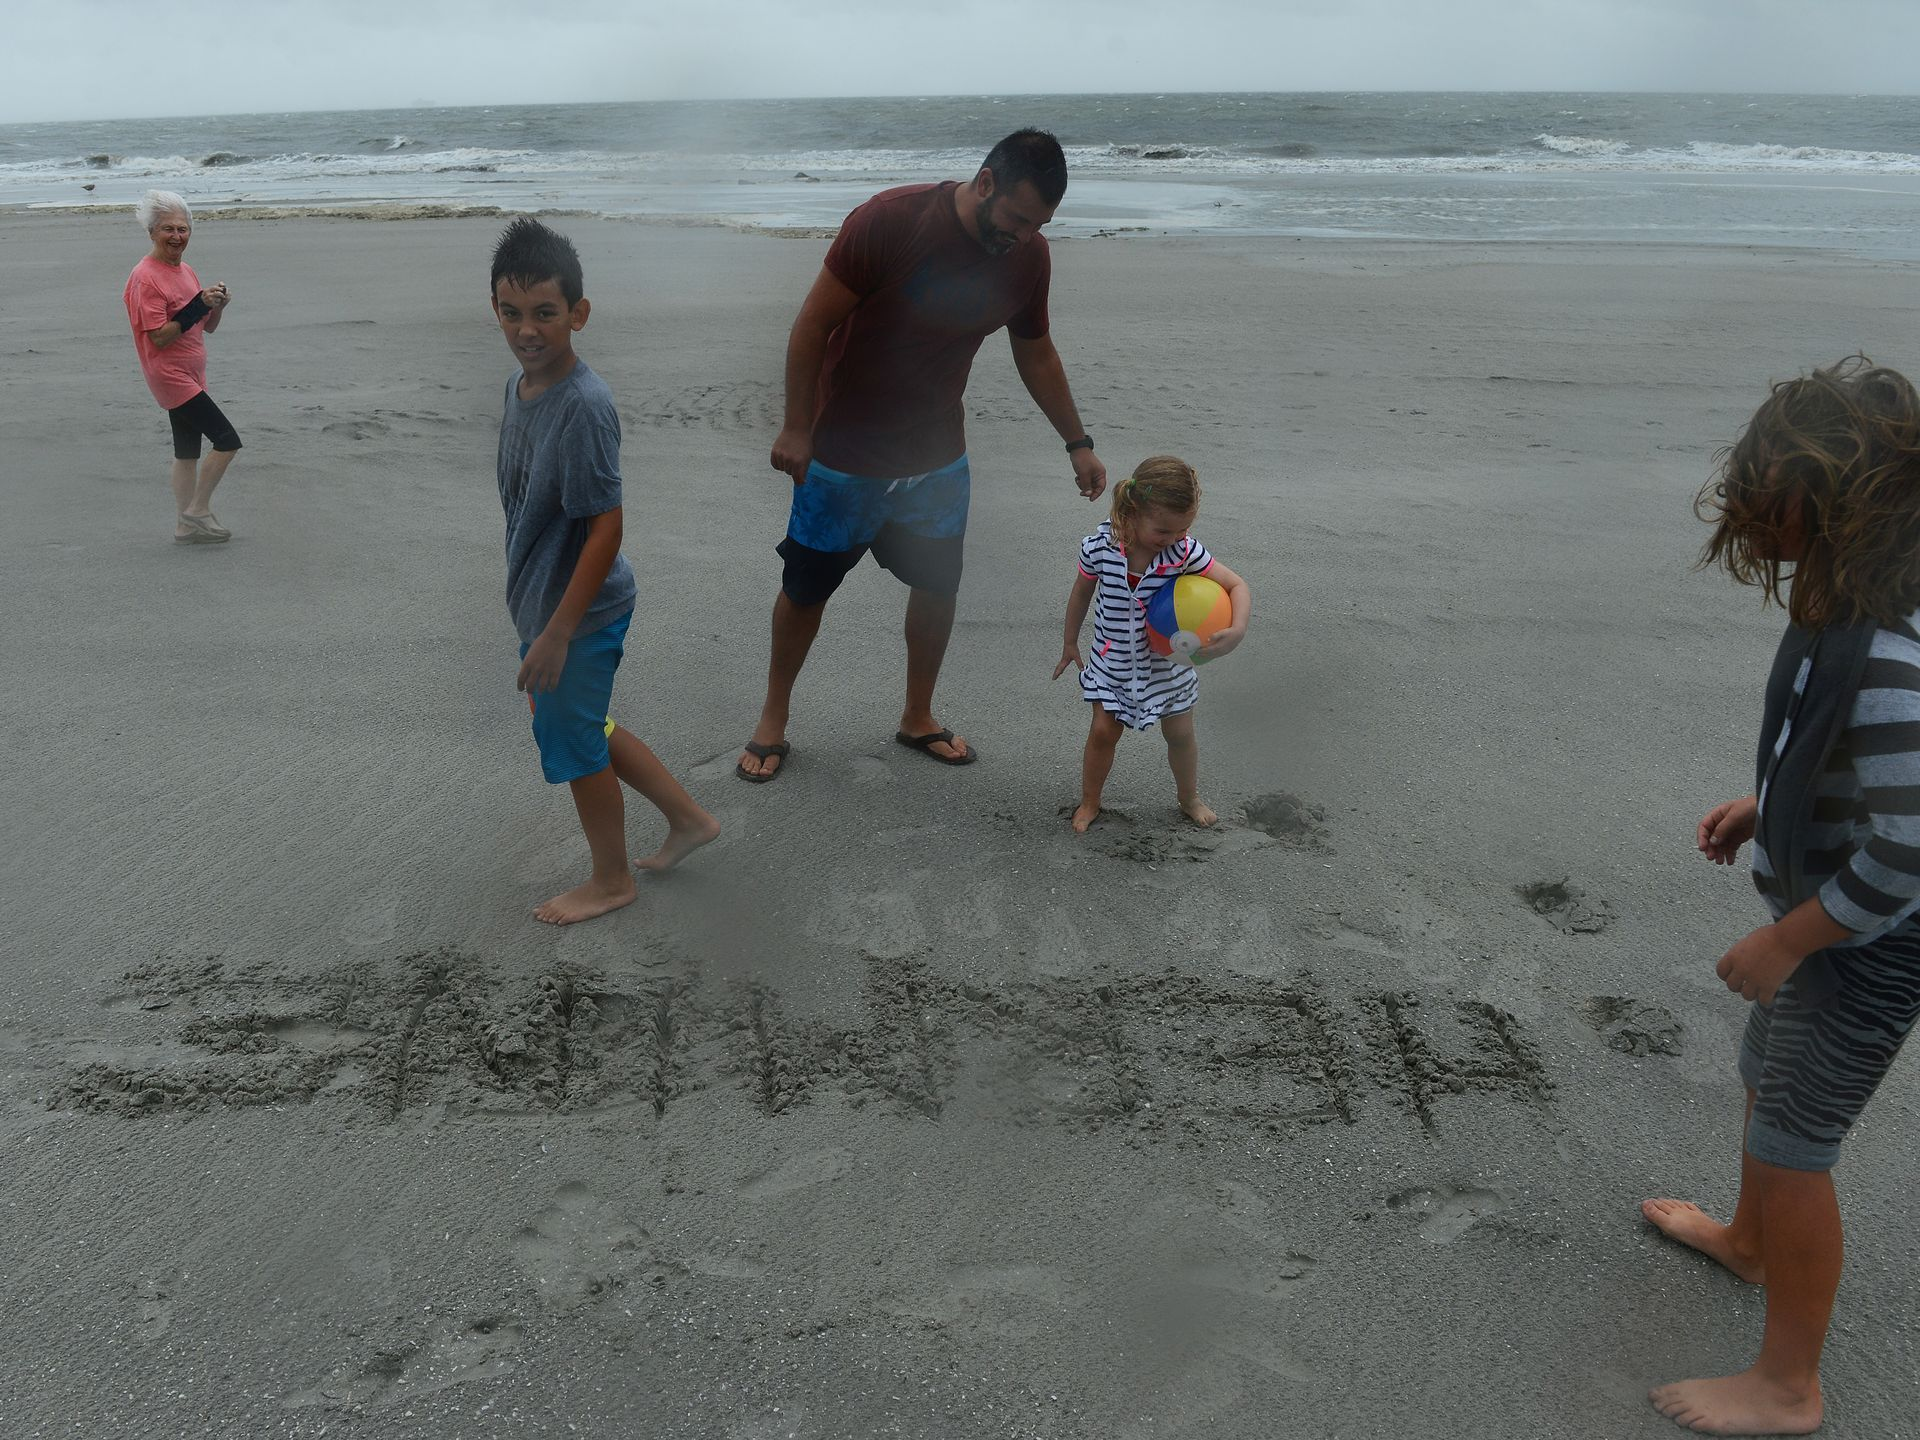 Alex Caro, center, of #VirginiaBeach  He wrote #Hermine in the sand